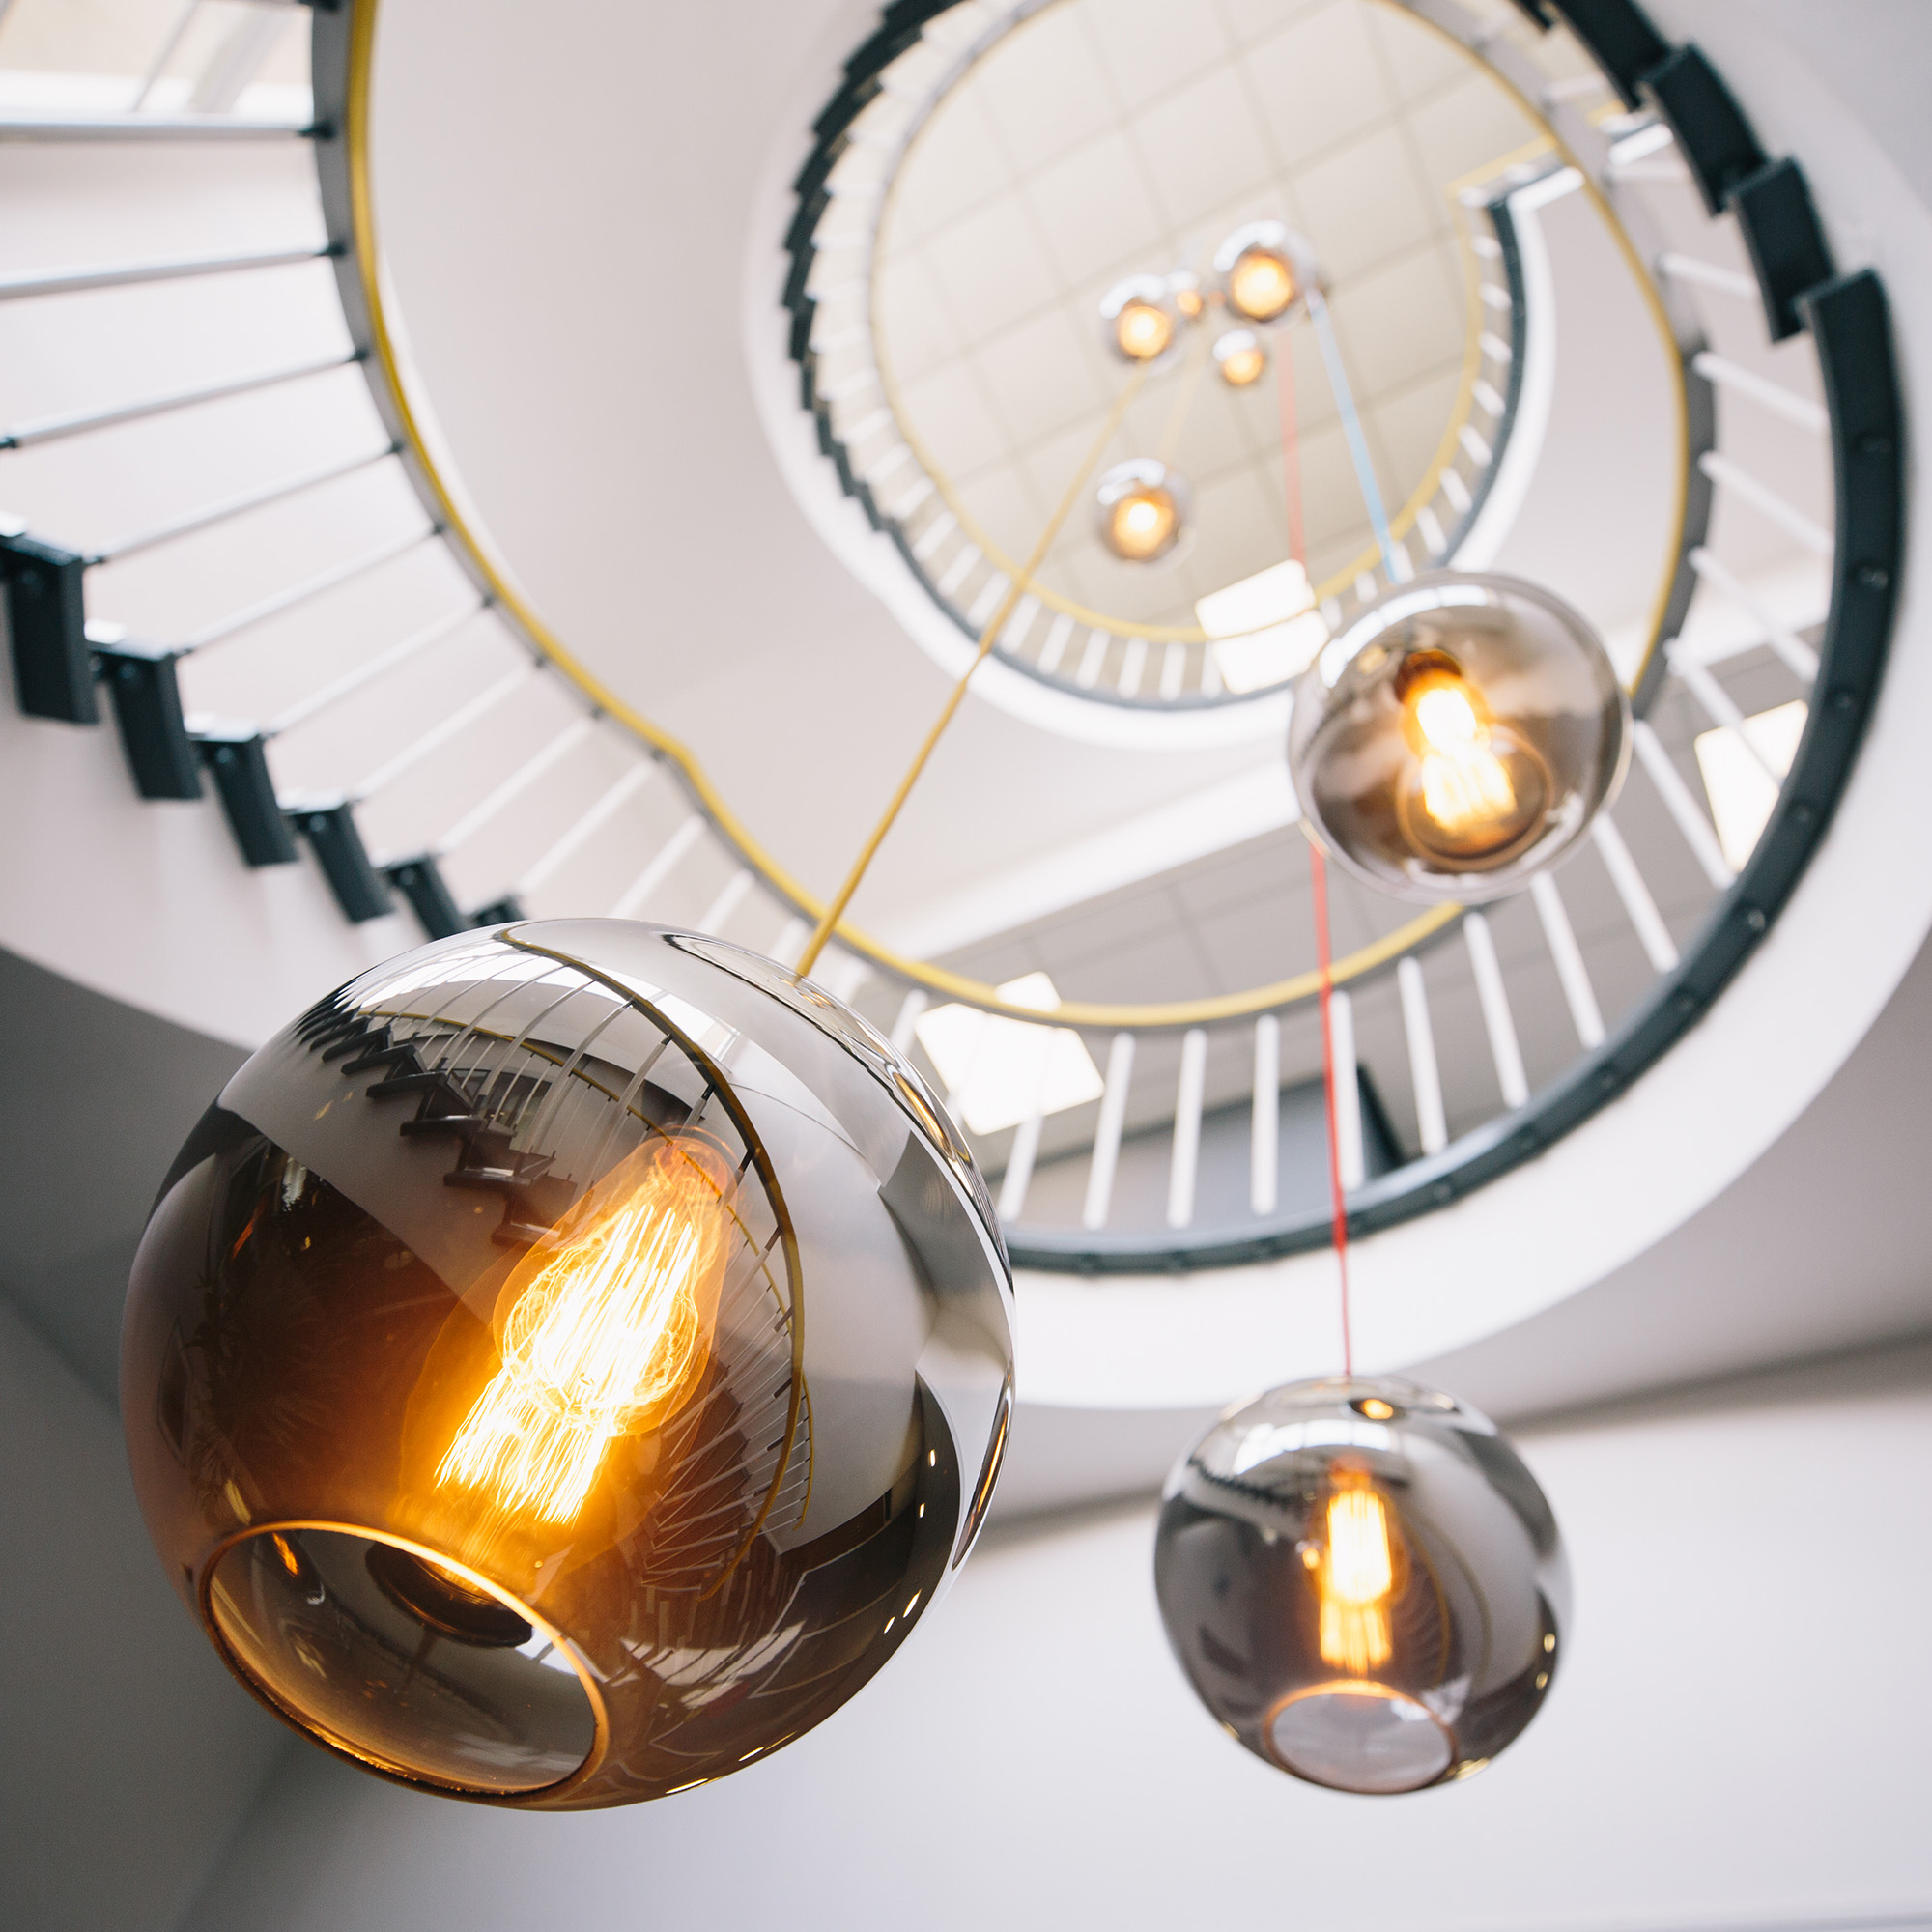 HUB26 stairwell lights